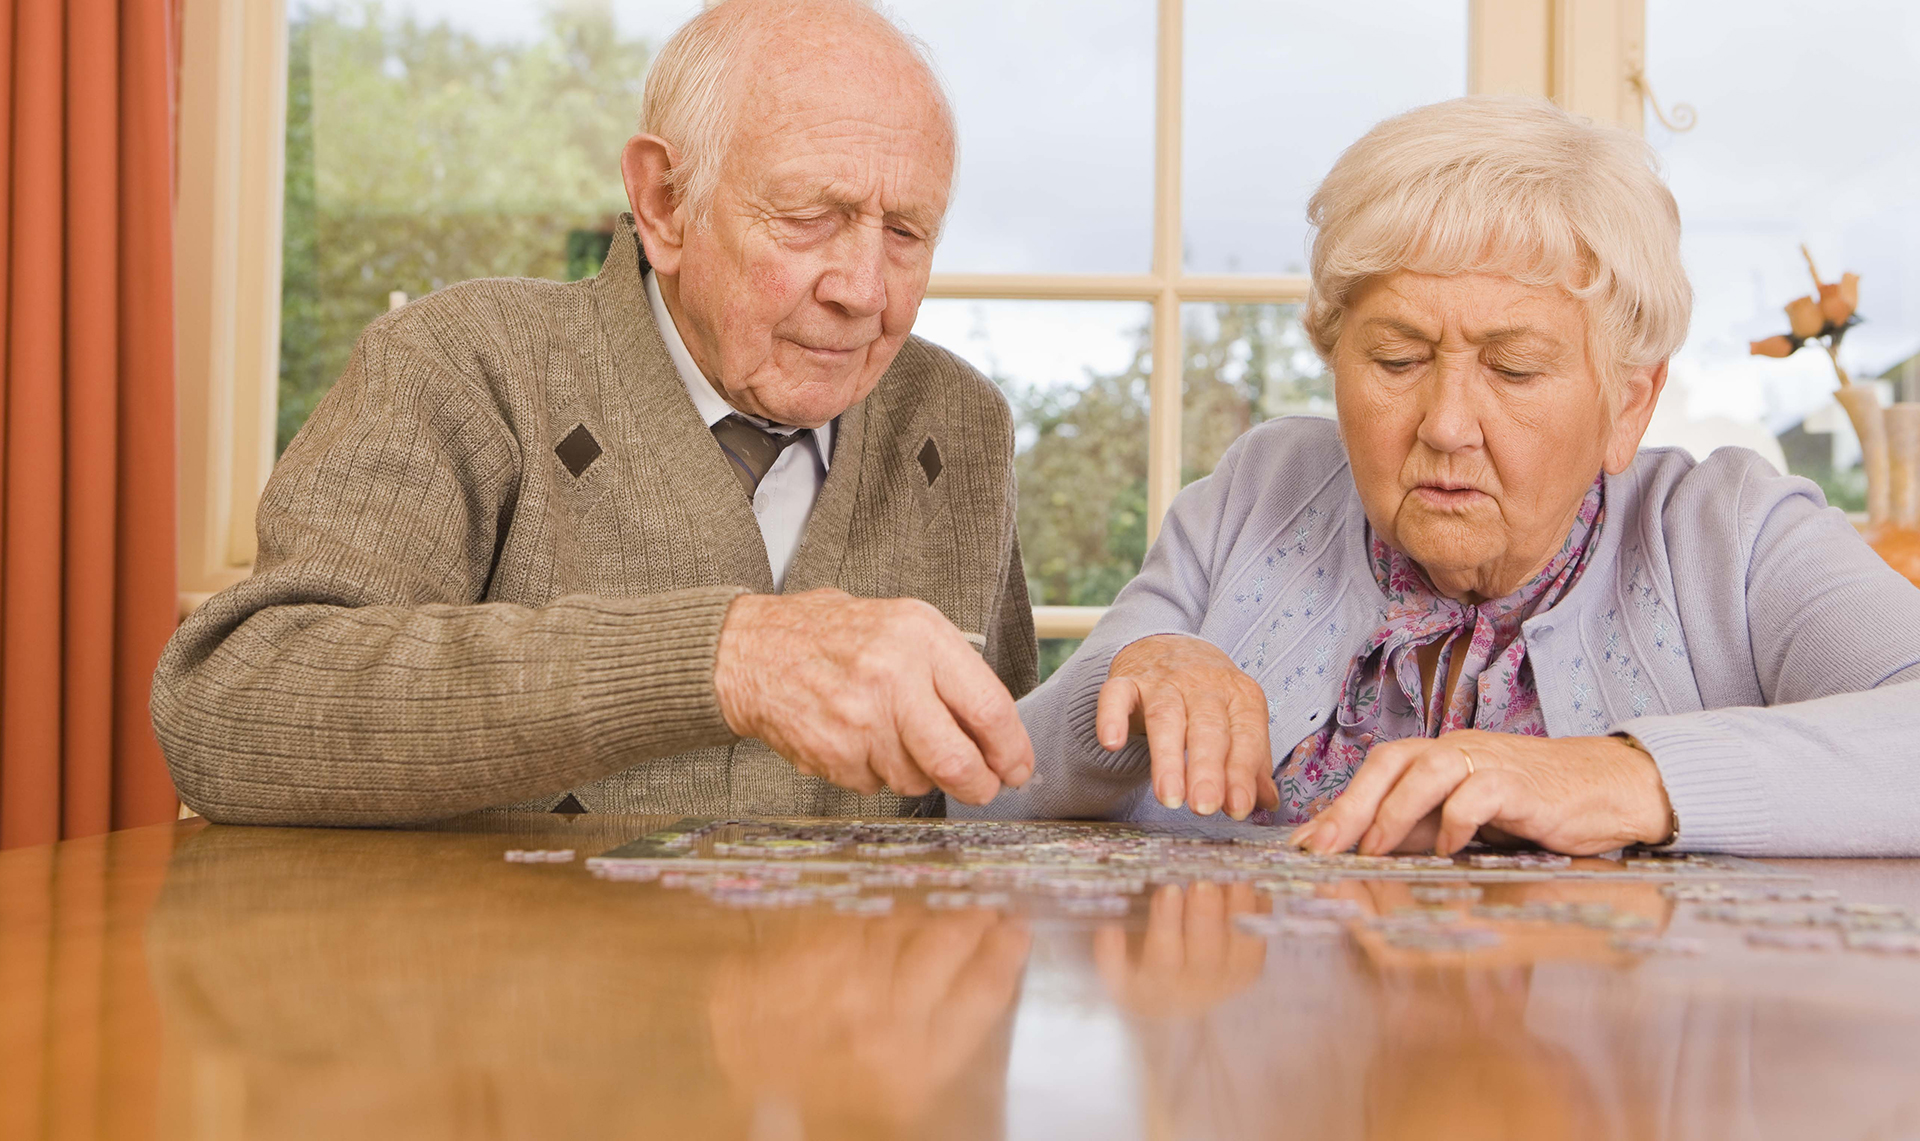 Когда будут выплачивать пенсии за август 2021 года из-за коронавируса на карту